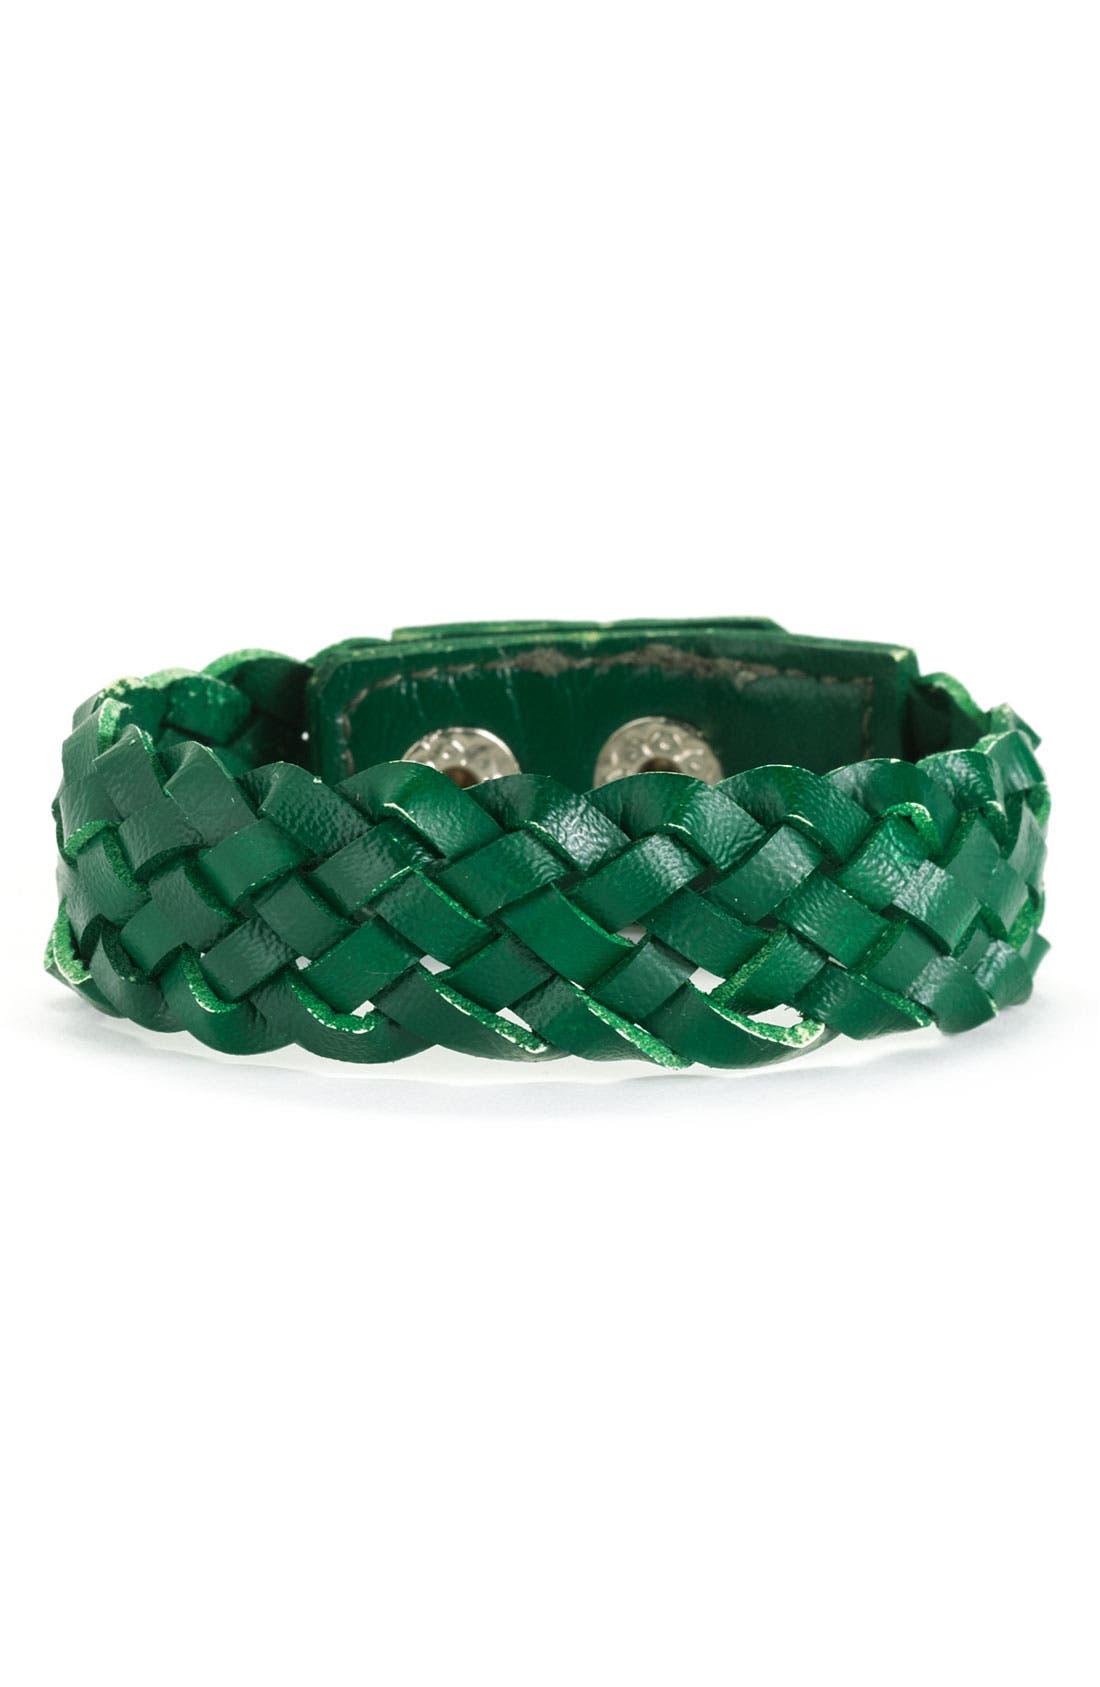 Alternate Image 1 Selected - Carole Woven Leather Bracelet